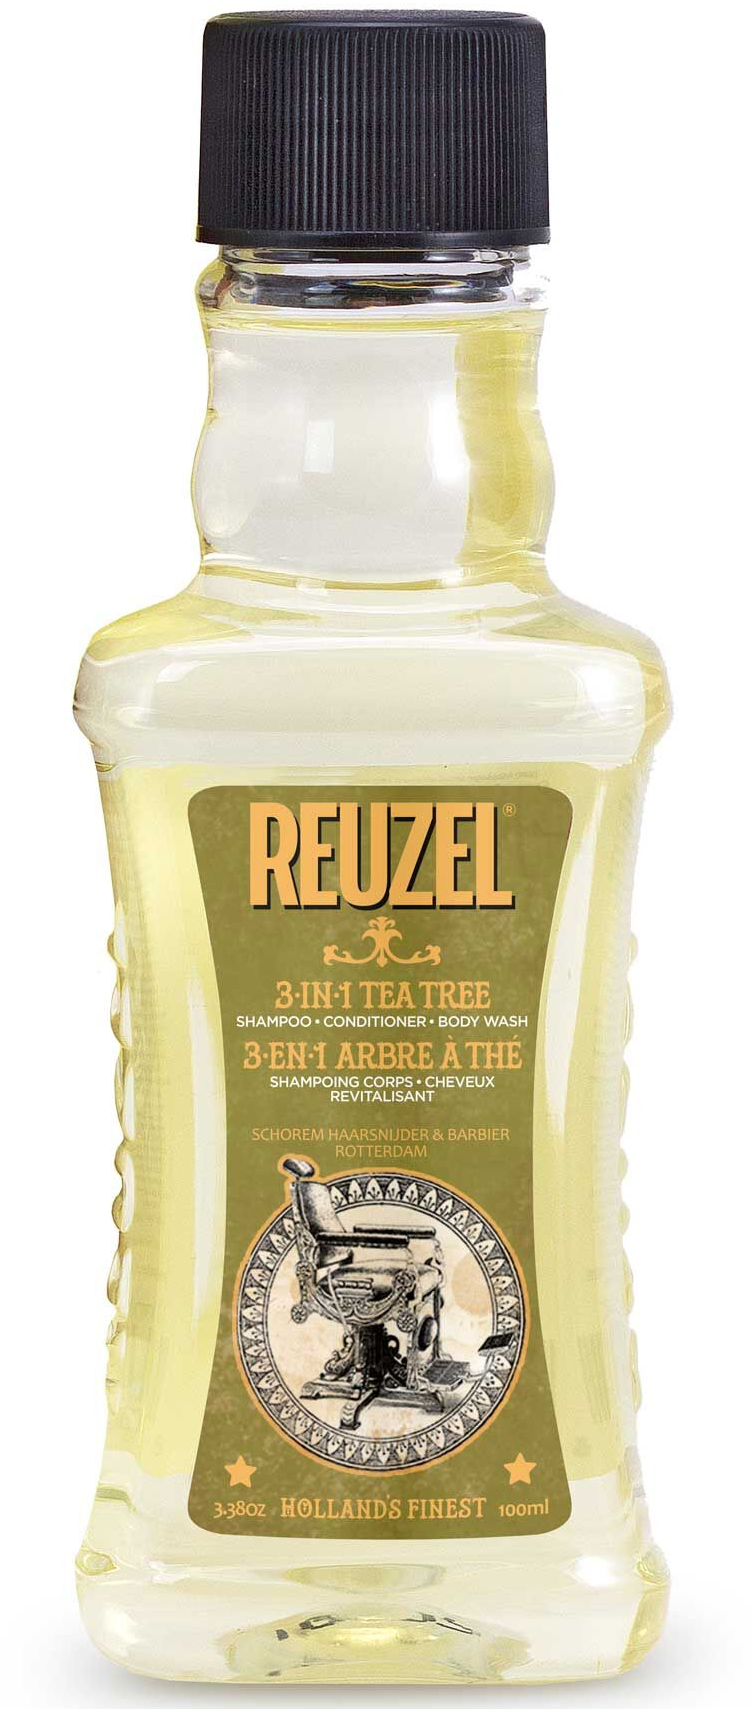 REUZEL 3-in-1 Tea Tree Shampoo-Conditioner-Body Wash 3.38oz/100ml